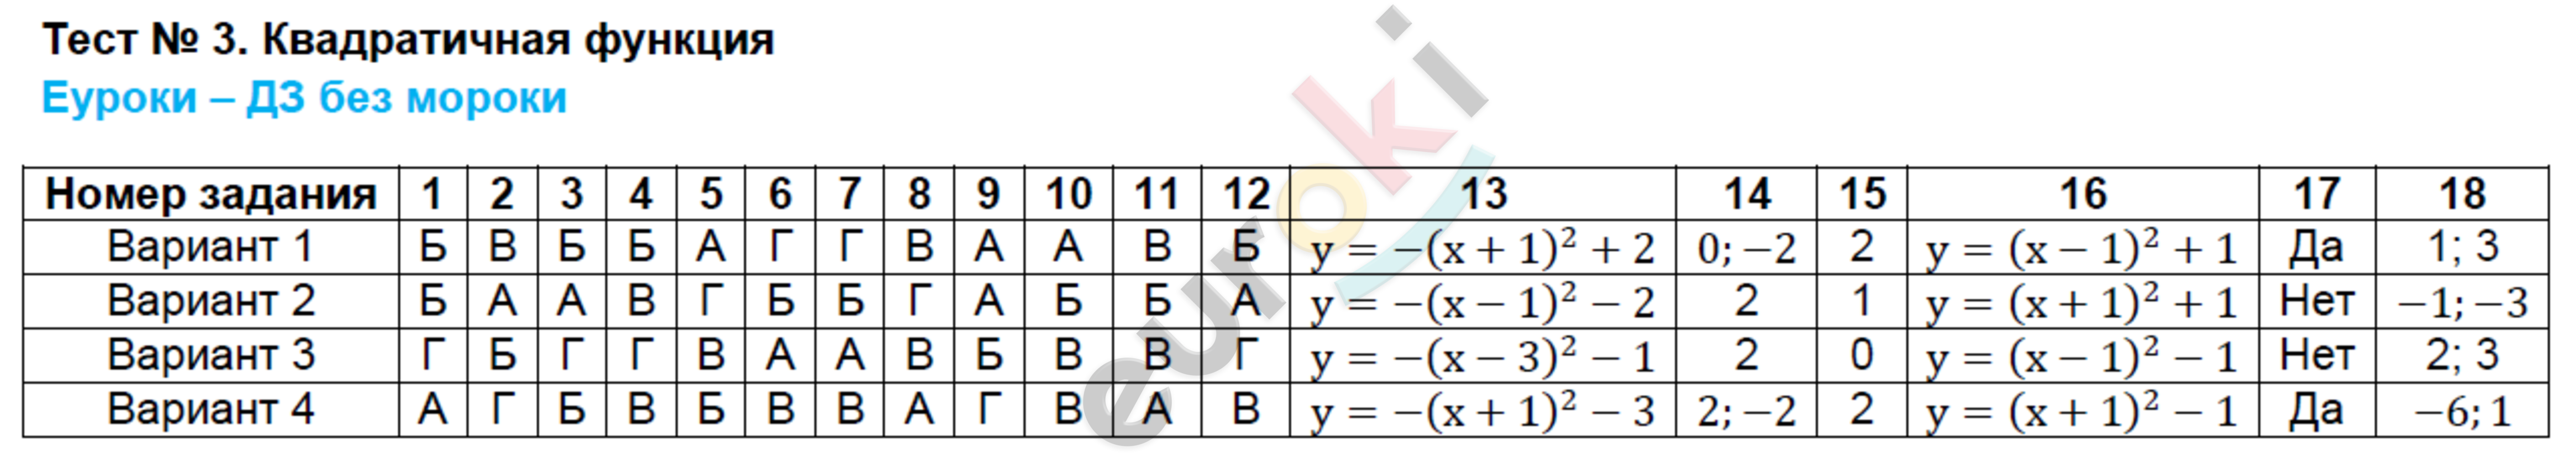 ГДЗ по алгебре 8 класс тесты Ключникова, Комиссарова. К учебнику Мордковича. Задание: Тест 3. Квадратичная функция